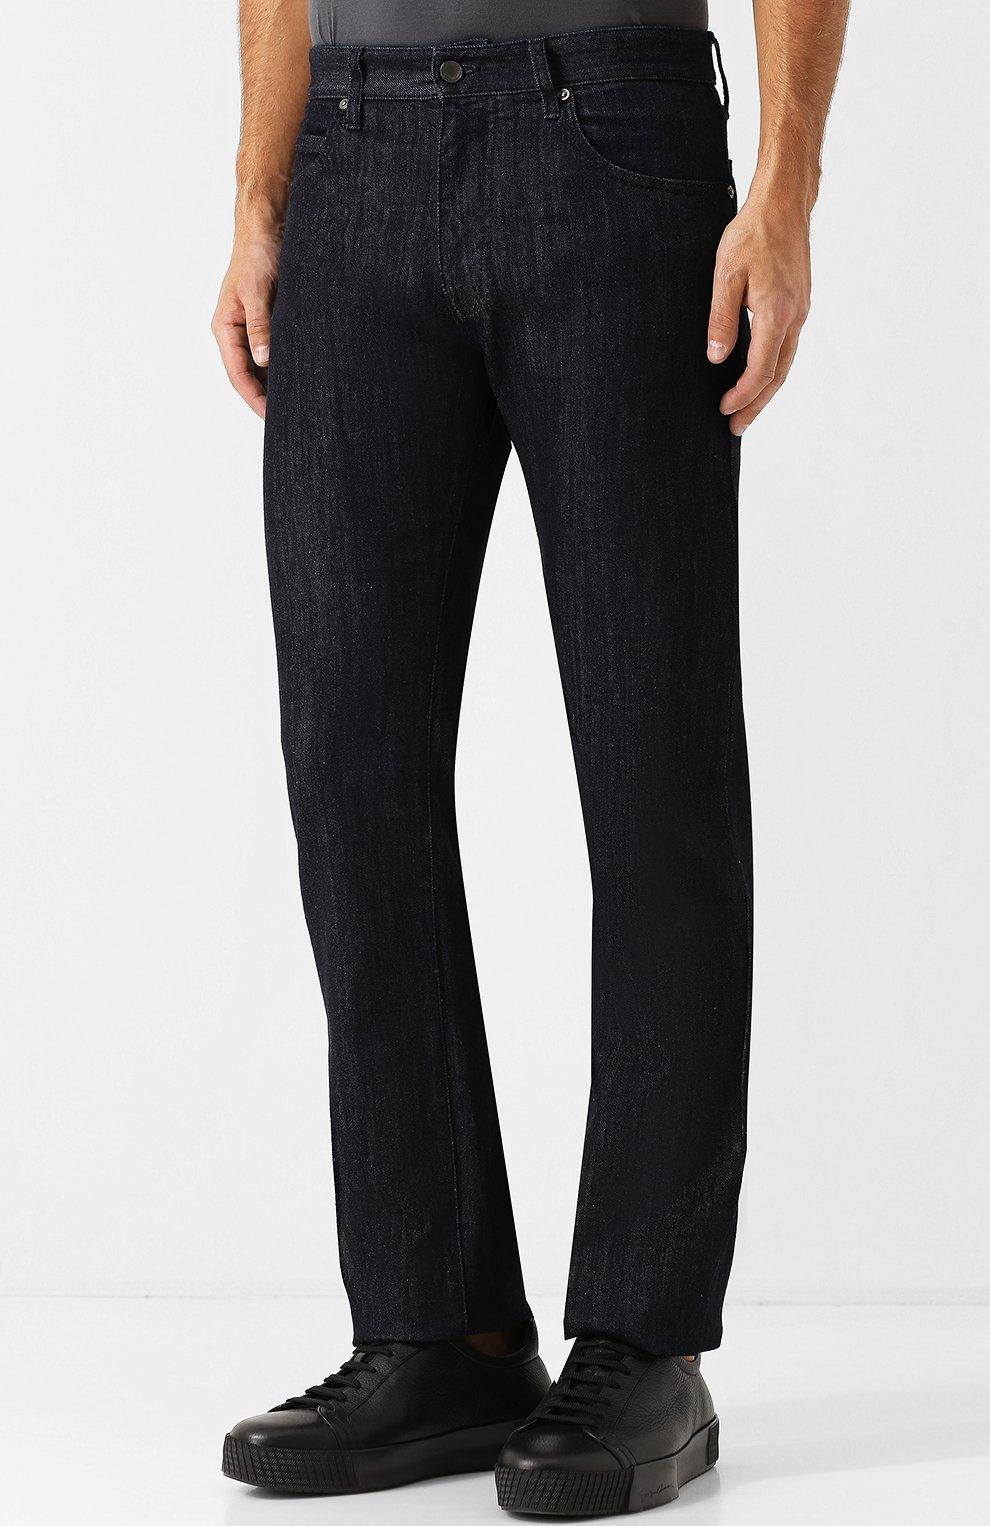 Мужские джинсы прямого кроя GIORGIO ARMANI синего цвета, арт. 6ZSJ02/SD30Z   Фото 3